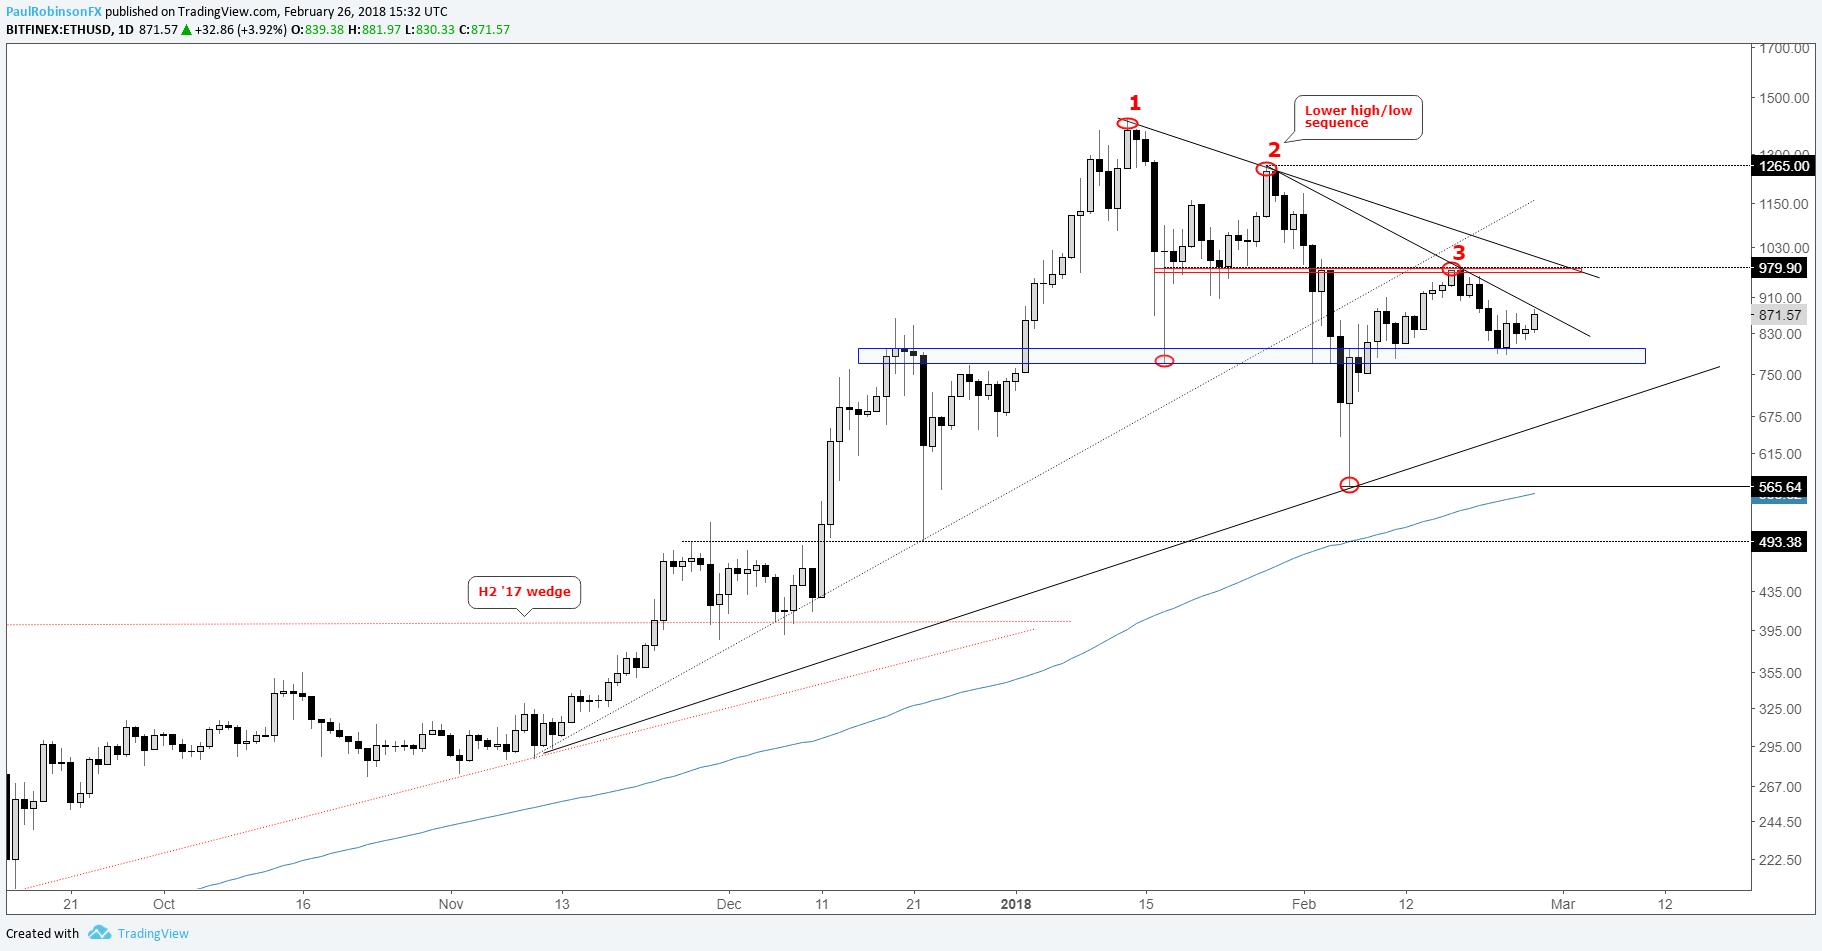 correlation between stock market and cryptocurrency